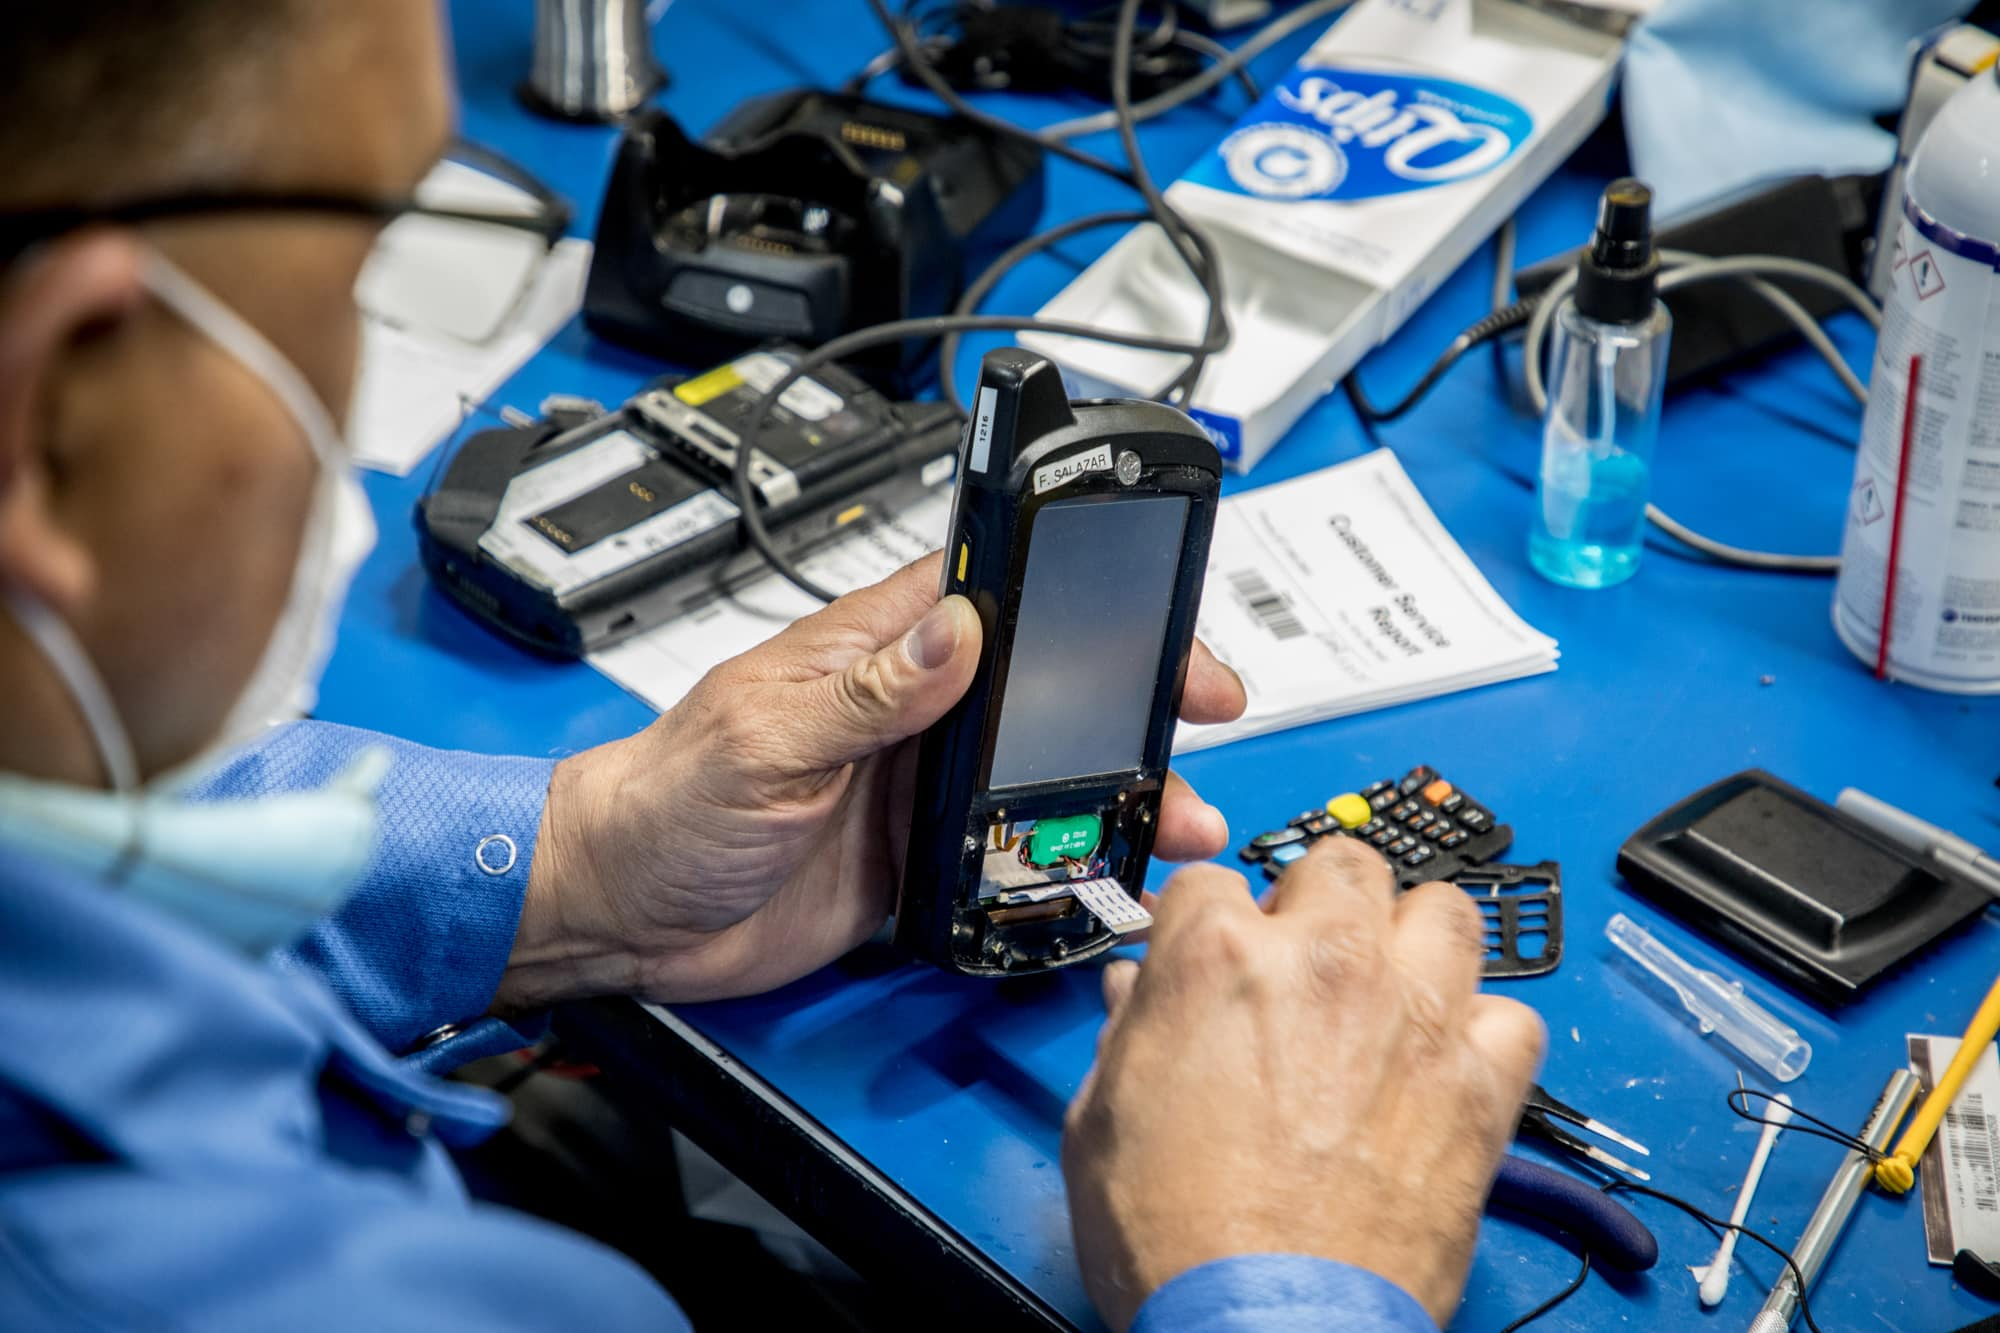 diagnostics and repair for